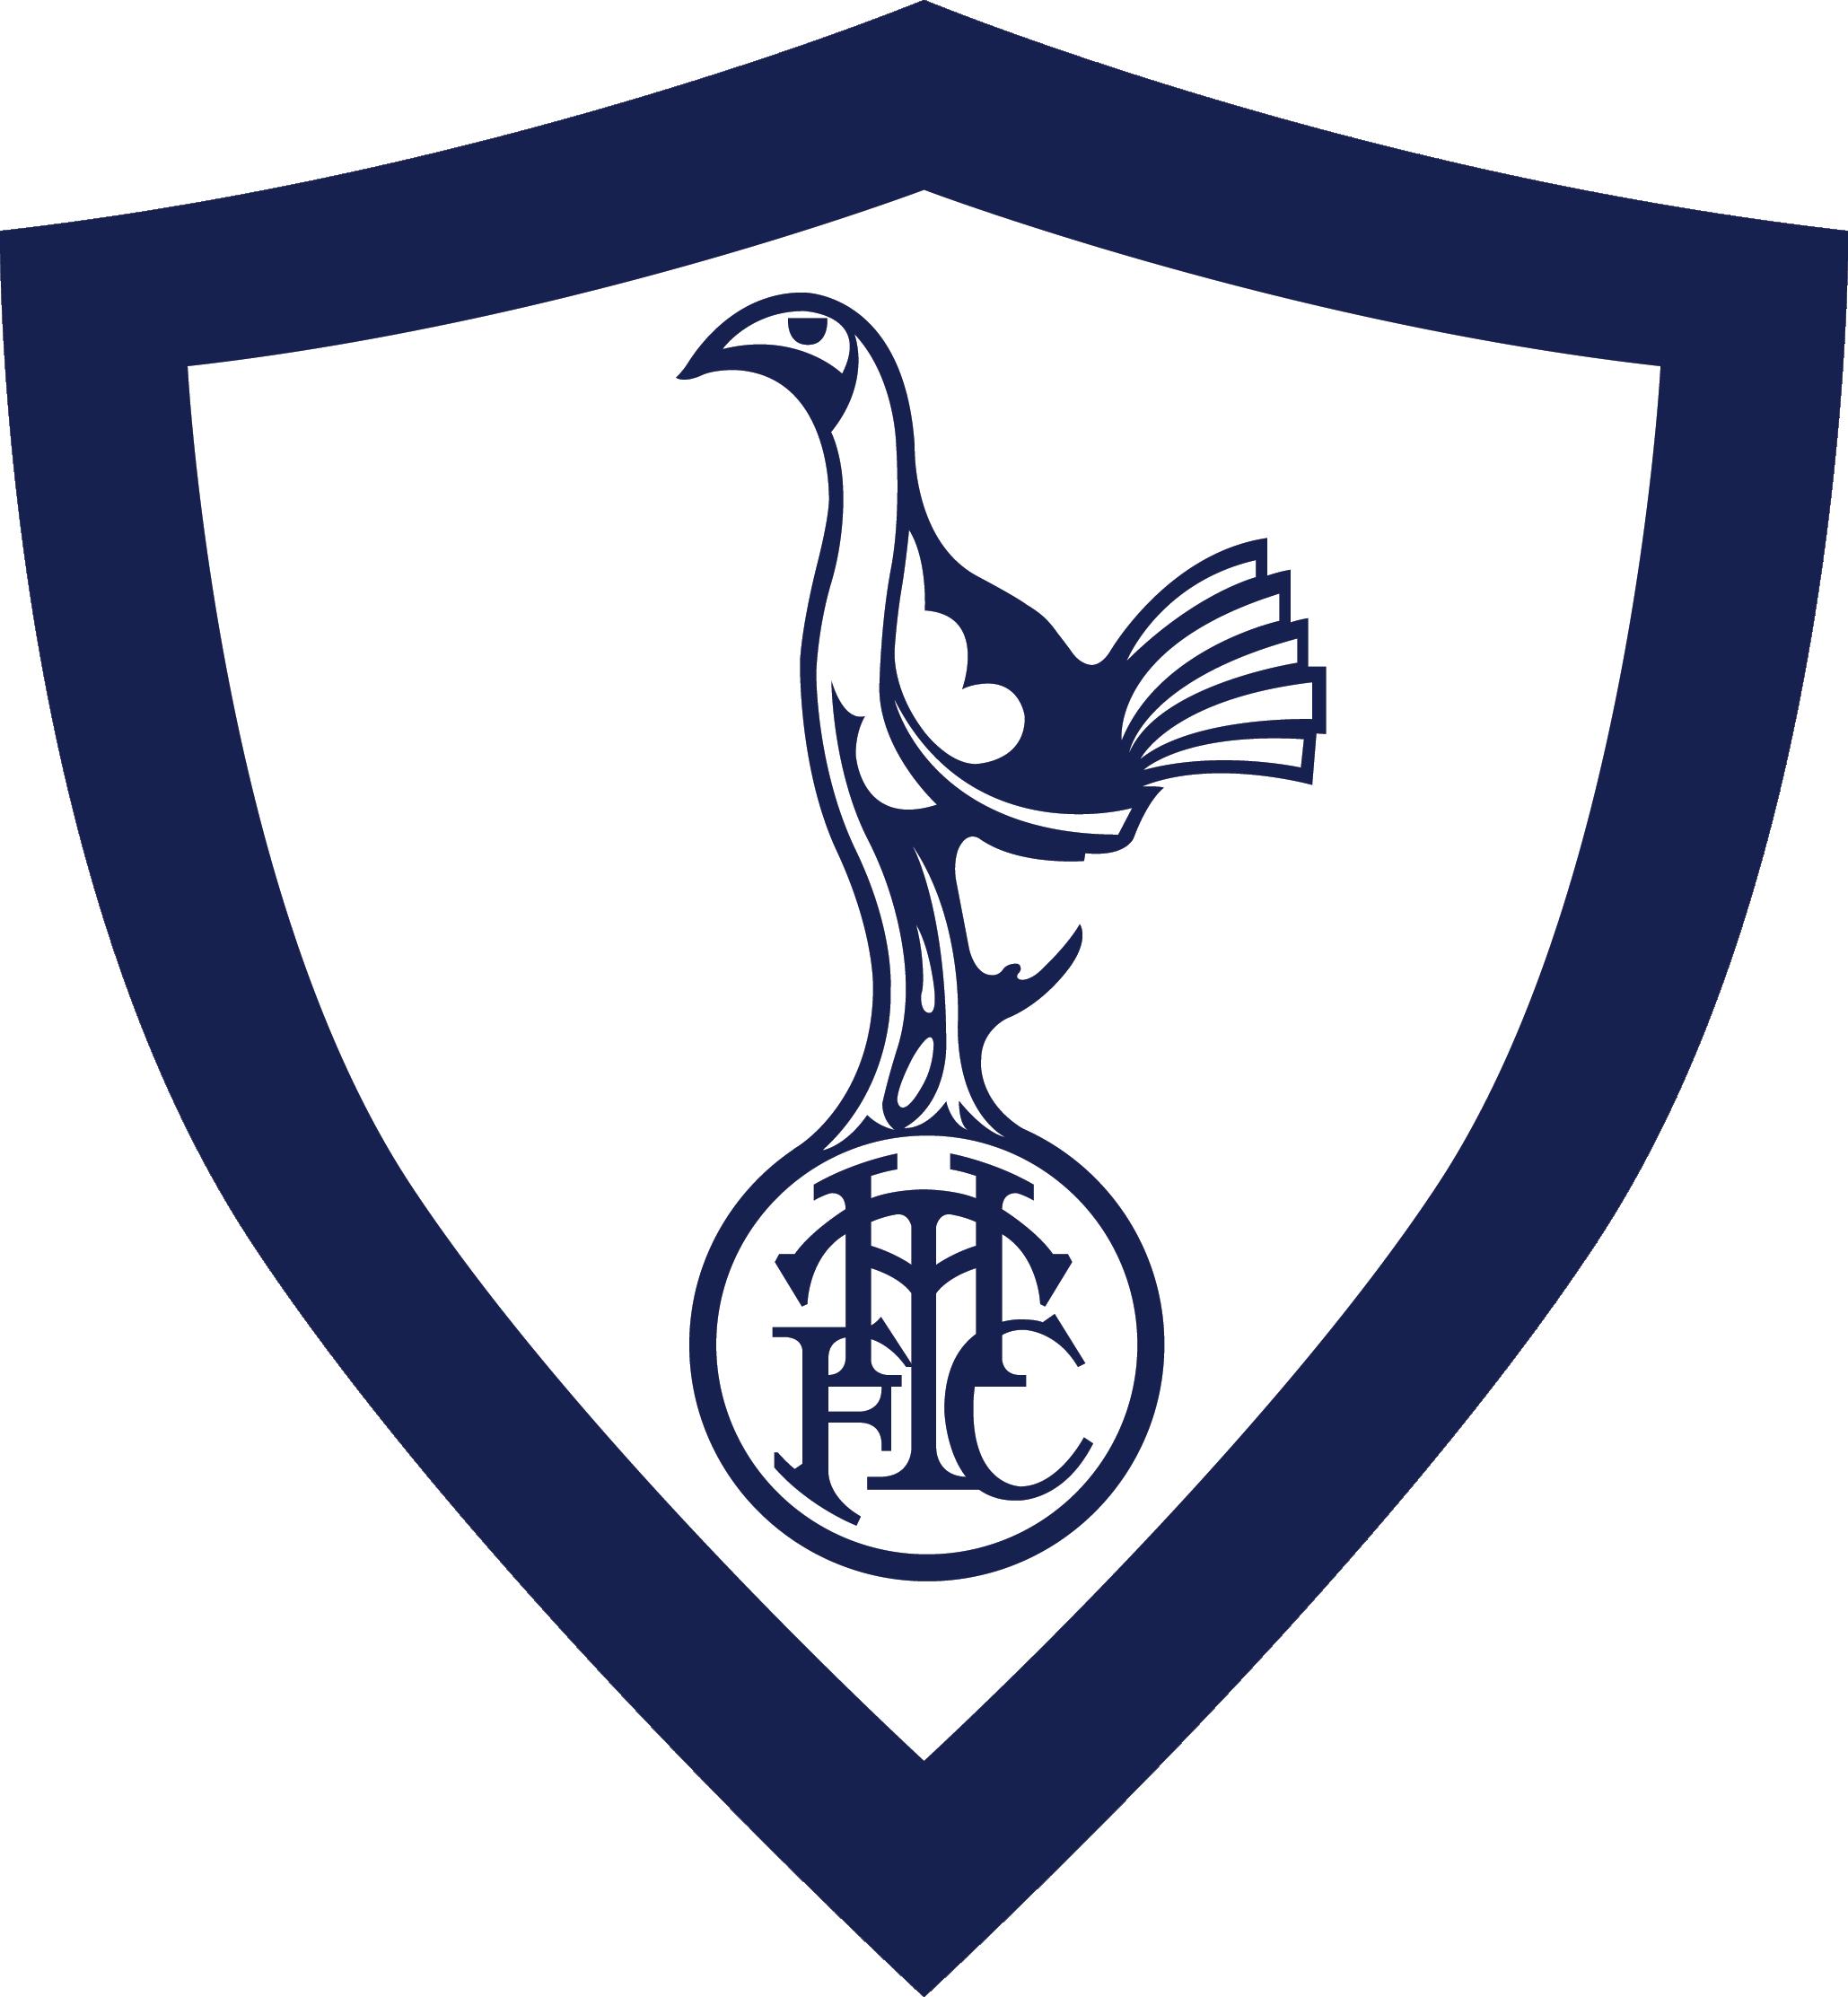 Tottenham Hotspur Tottenham Hotspur Retro Logo Clipart Full Size Clipart 4095669 Pinclipart